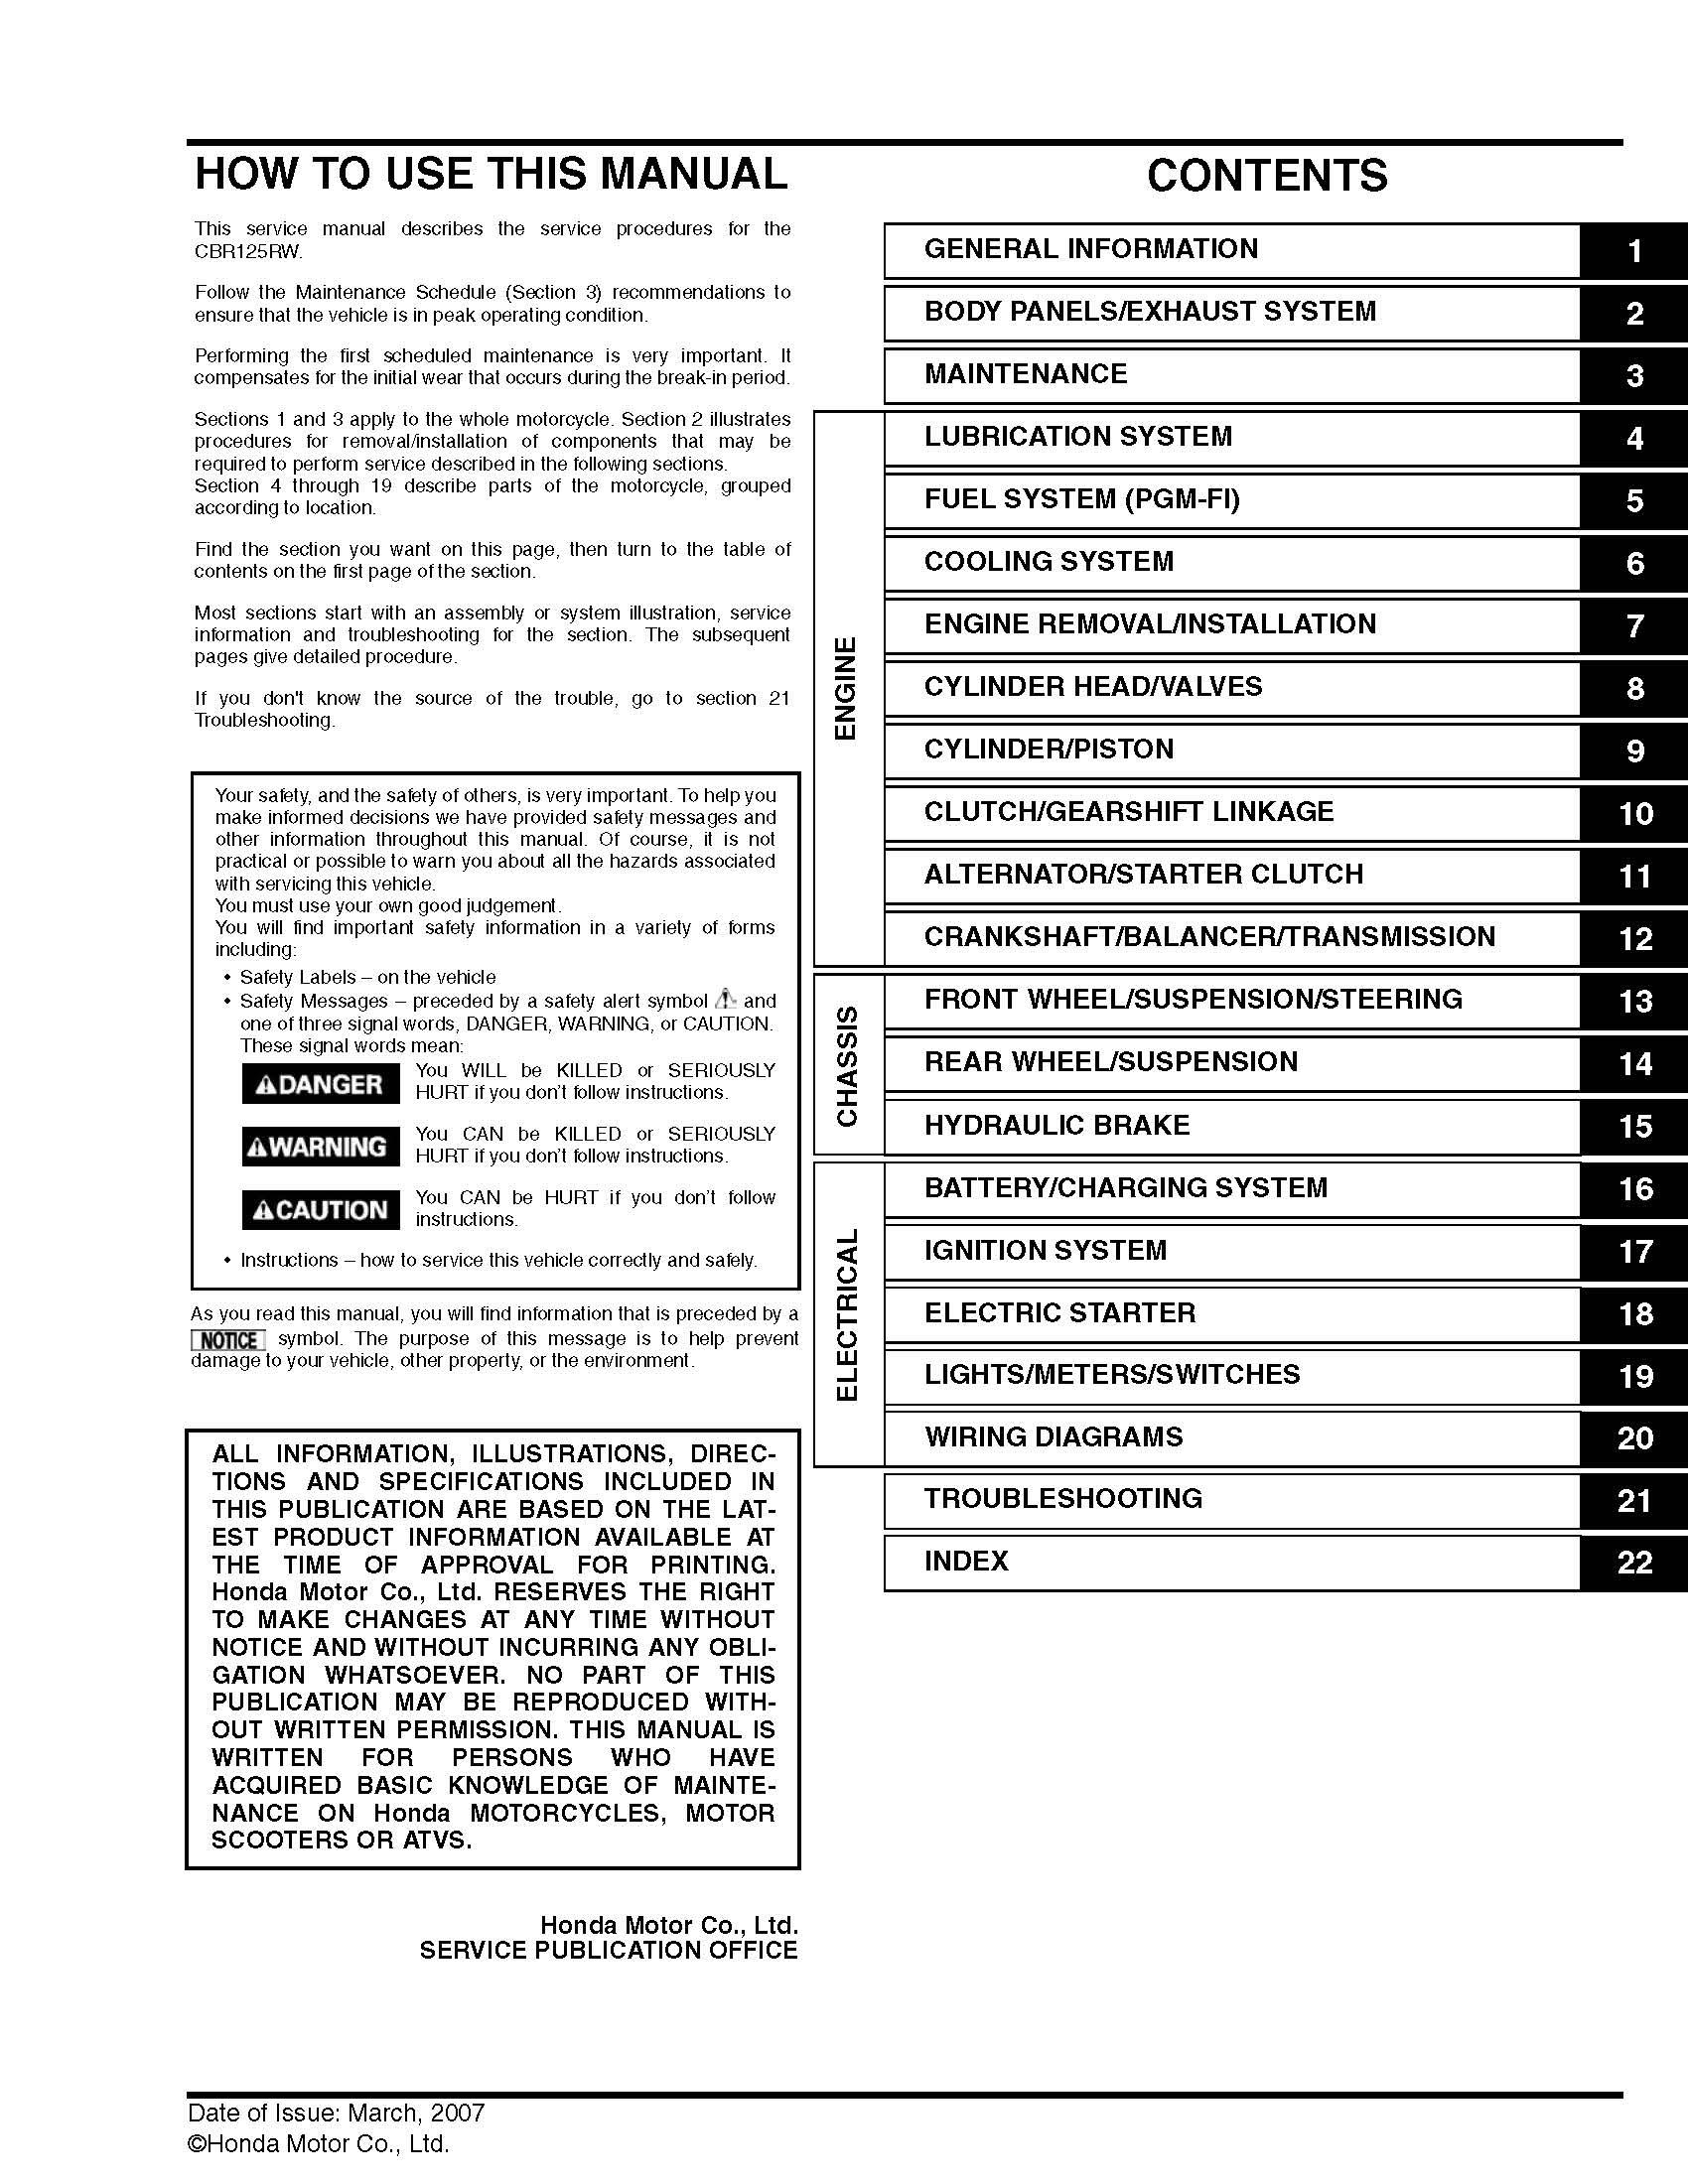 Workshop manual for Honda CBR125RW (2007)